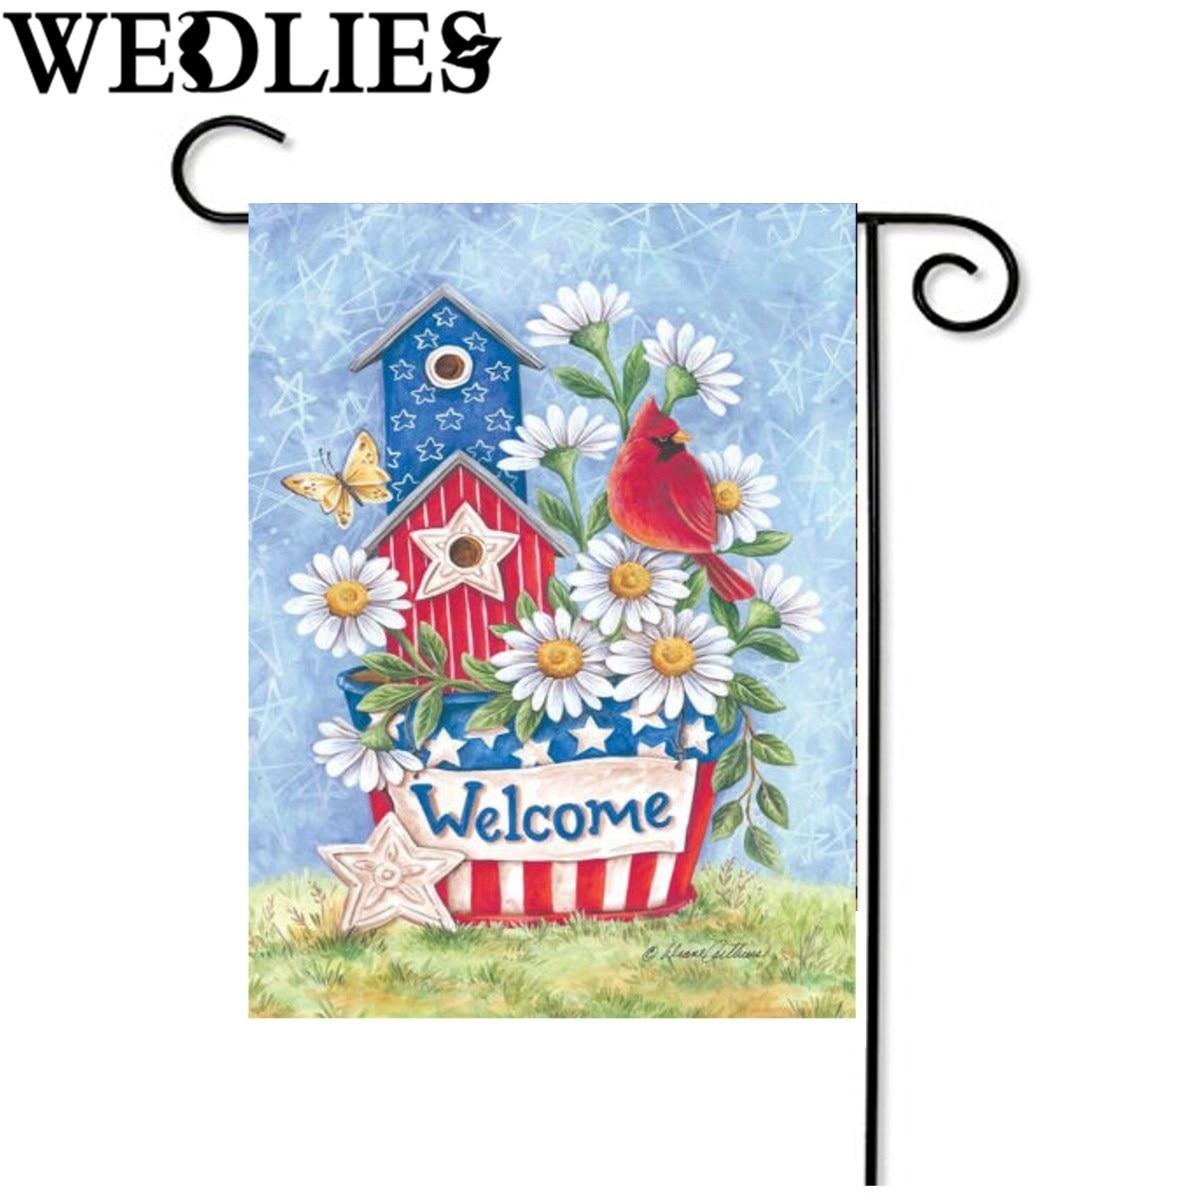 Blossom Daisies Flag Patriotic Cardinal Welcome Home Garden Flag Banner  Accessories Home Garden Decorative Craftwork 12.5